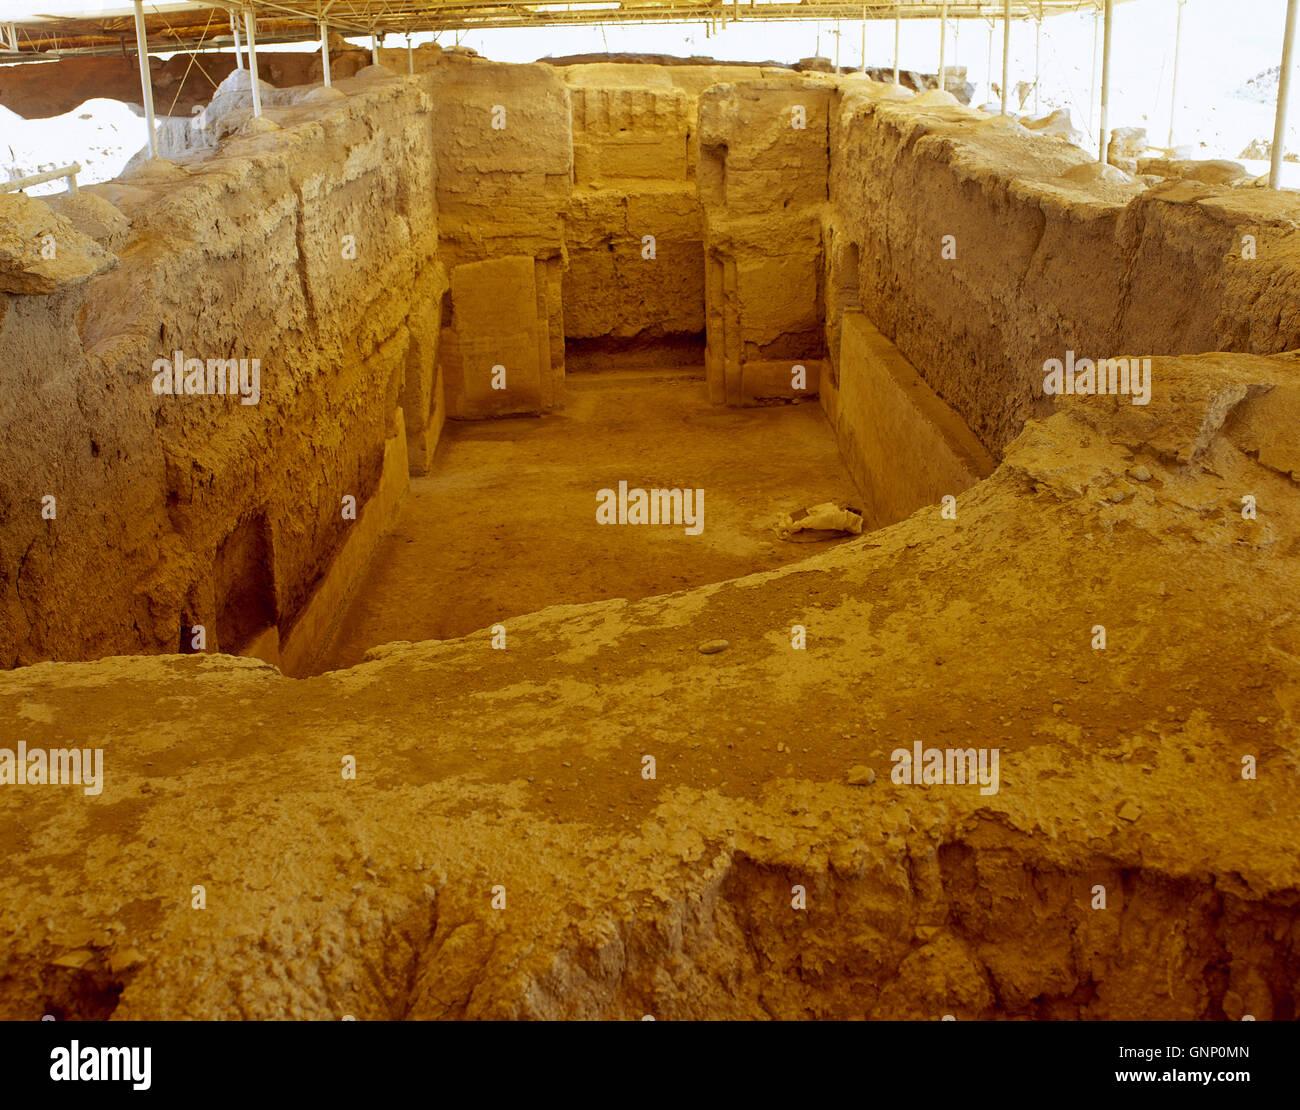 La Syrie. Mari (Tell Hariri) moderne. L'ancienne ville sémitique. 2900 BC-1759 BC. Palais Royal. Salle Photo Stock